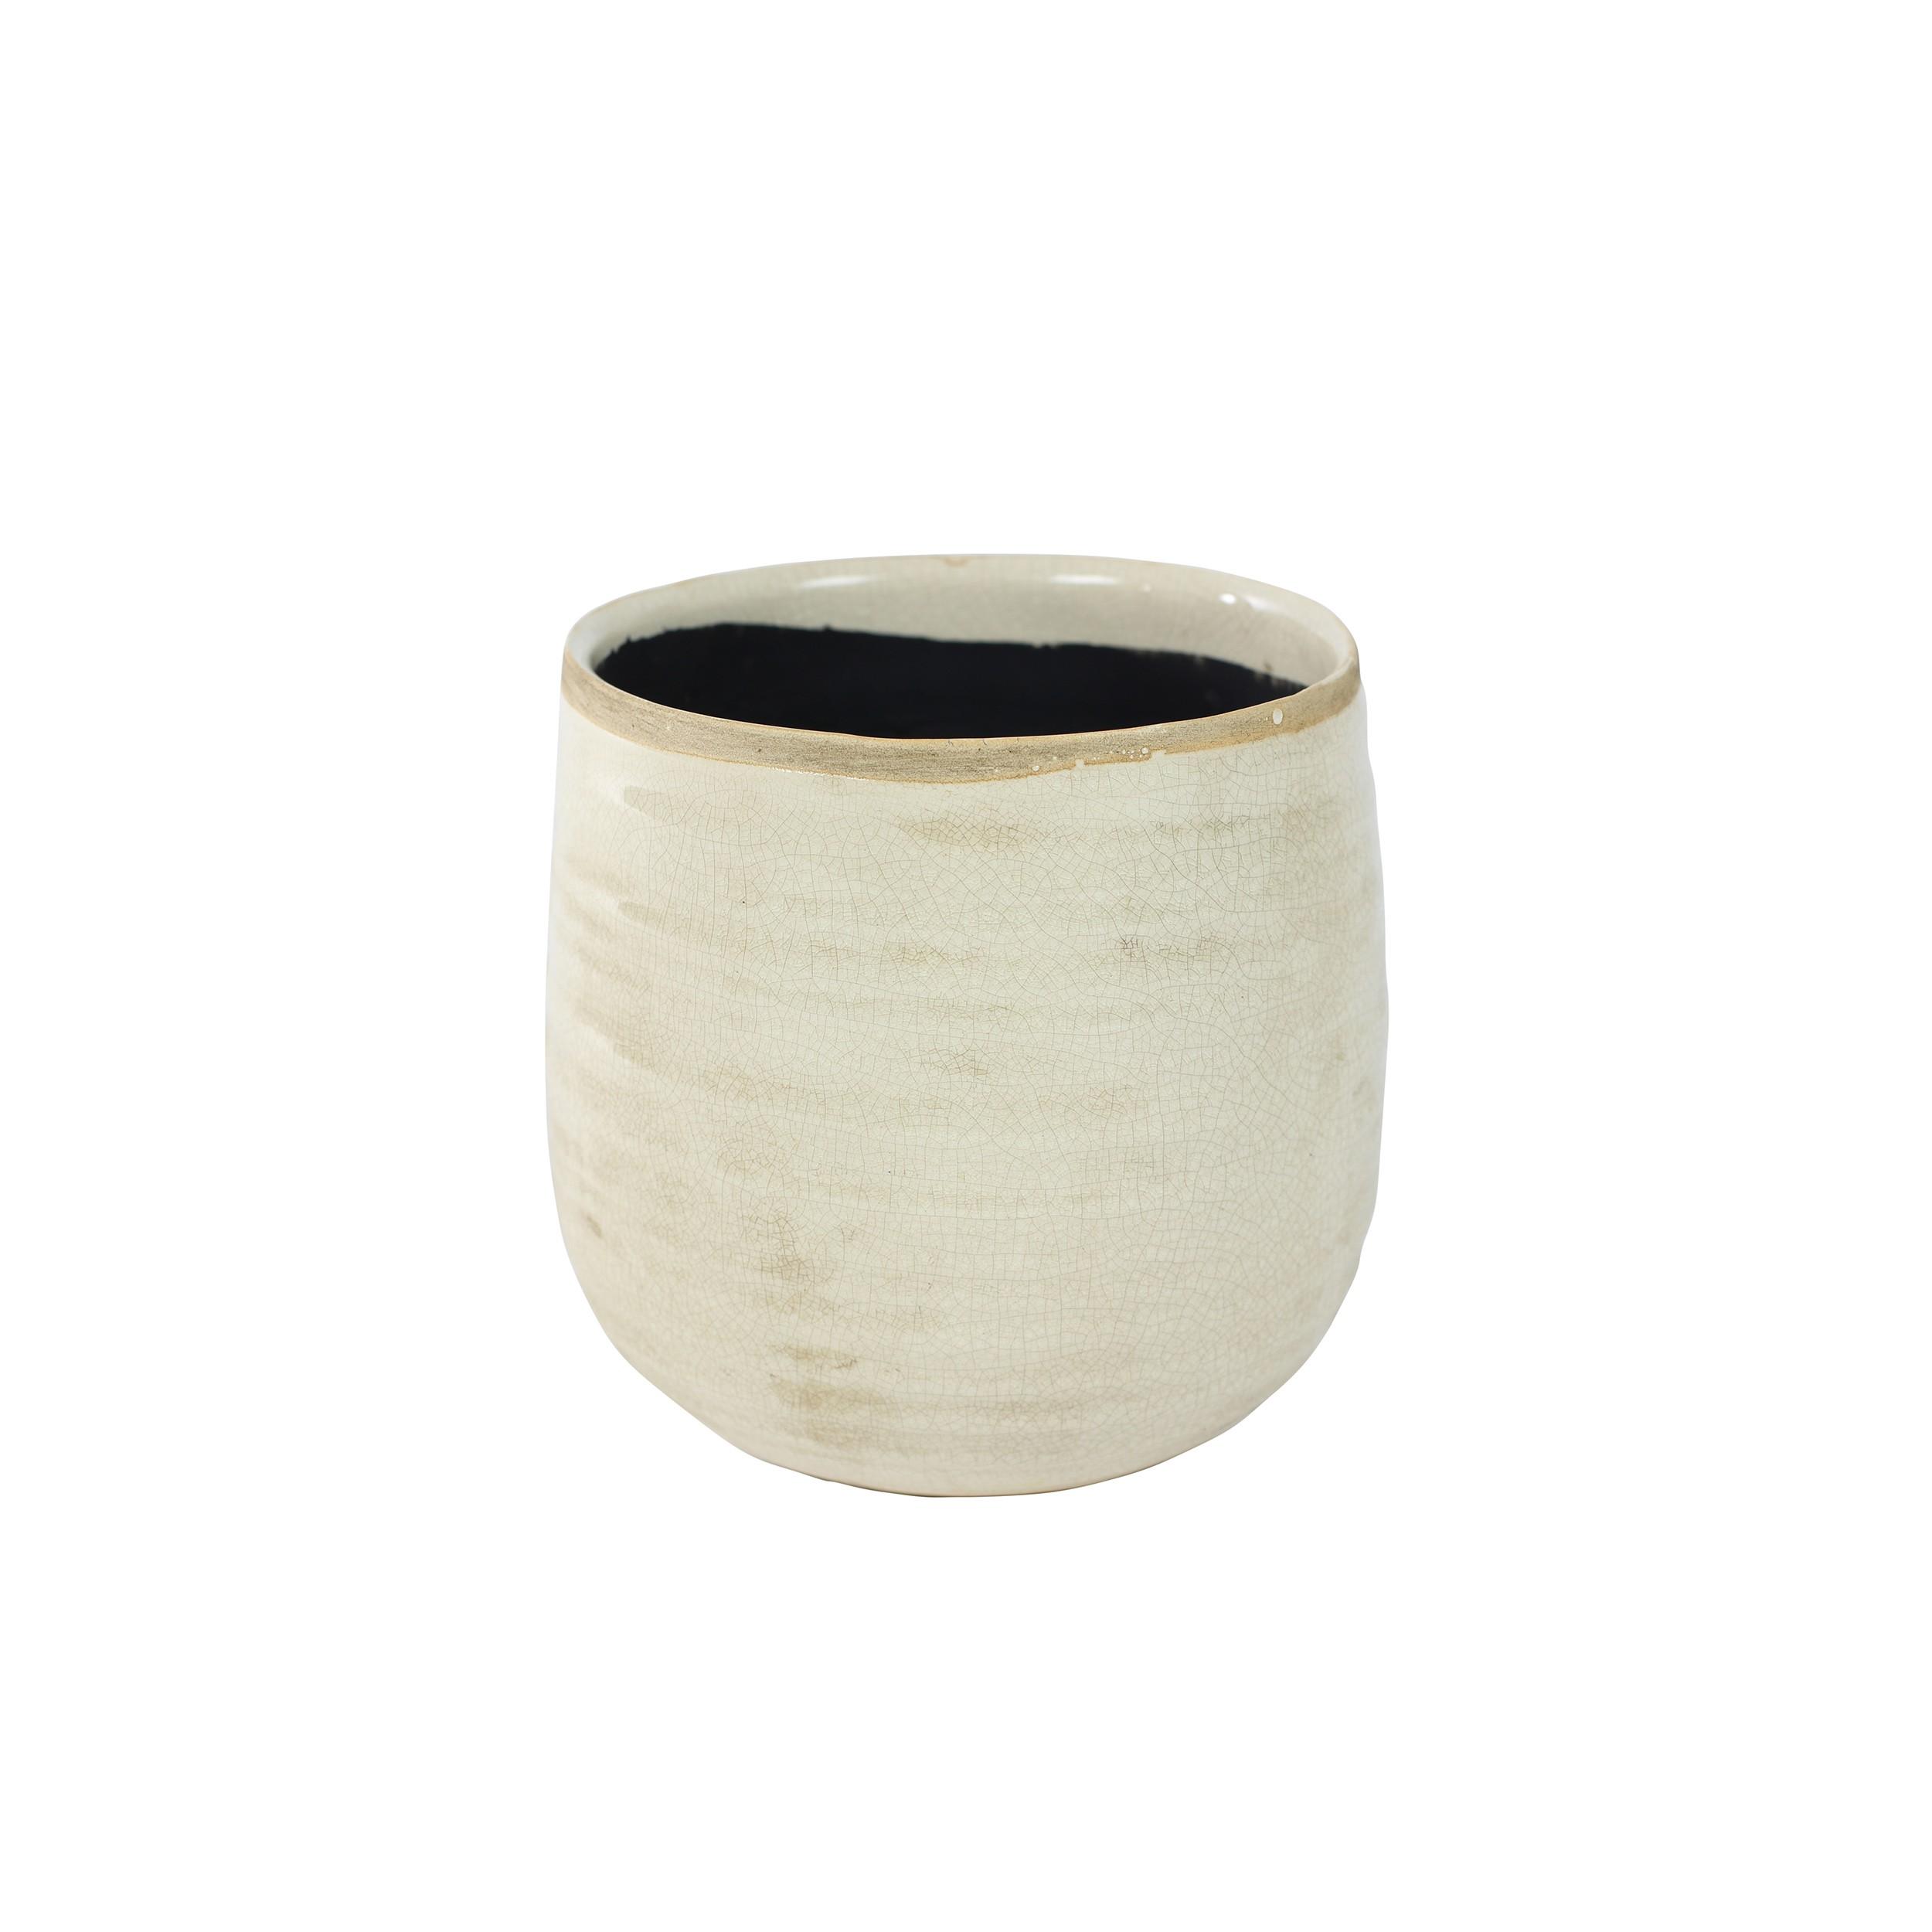 blumentopf keramik 12 5cm iris bertopf pflanztopf glasiert indoor ebay. Black Bedroom Furniture Sets. Home Design Ideas